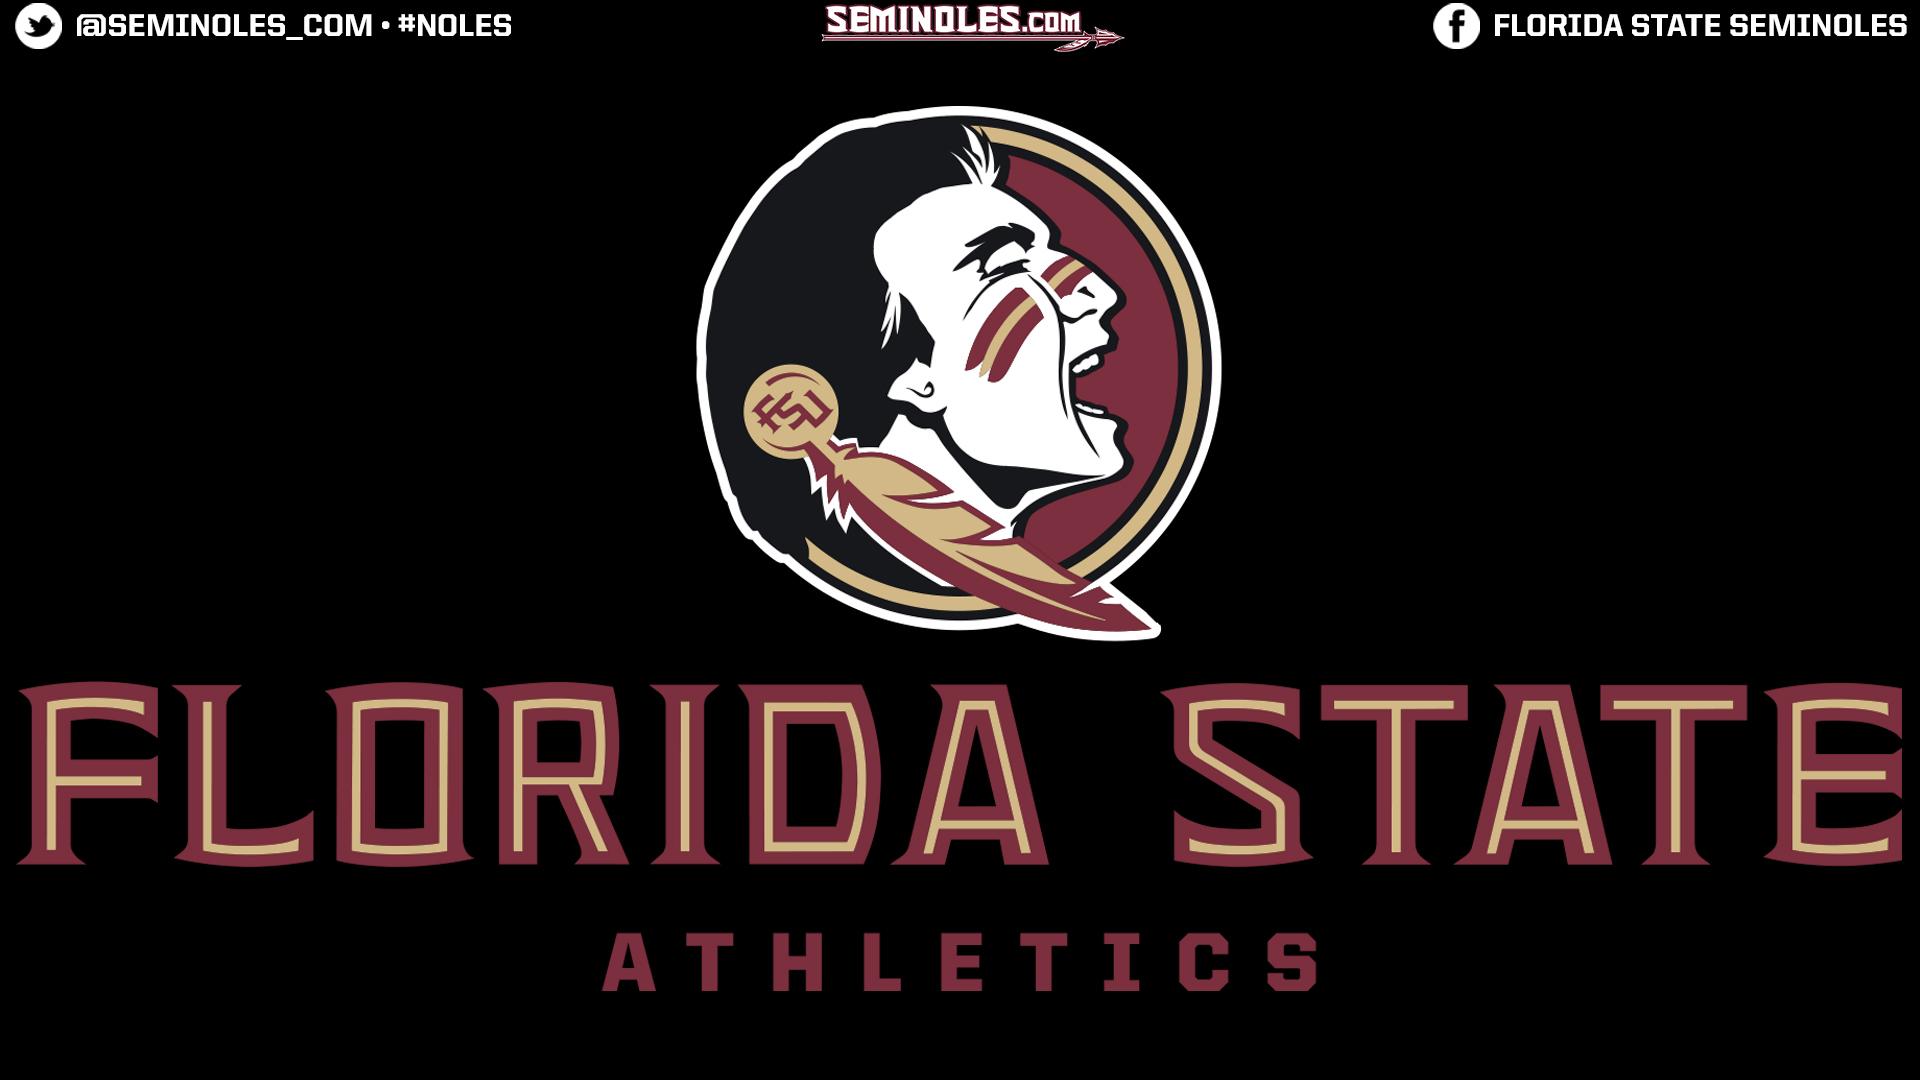 genrel wallpaper   Florida State Seminoles Official Athletic Site 1920x1080